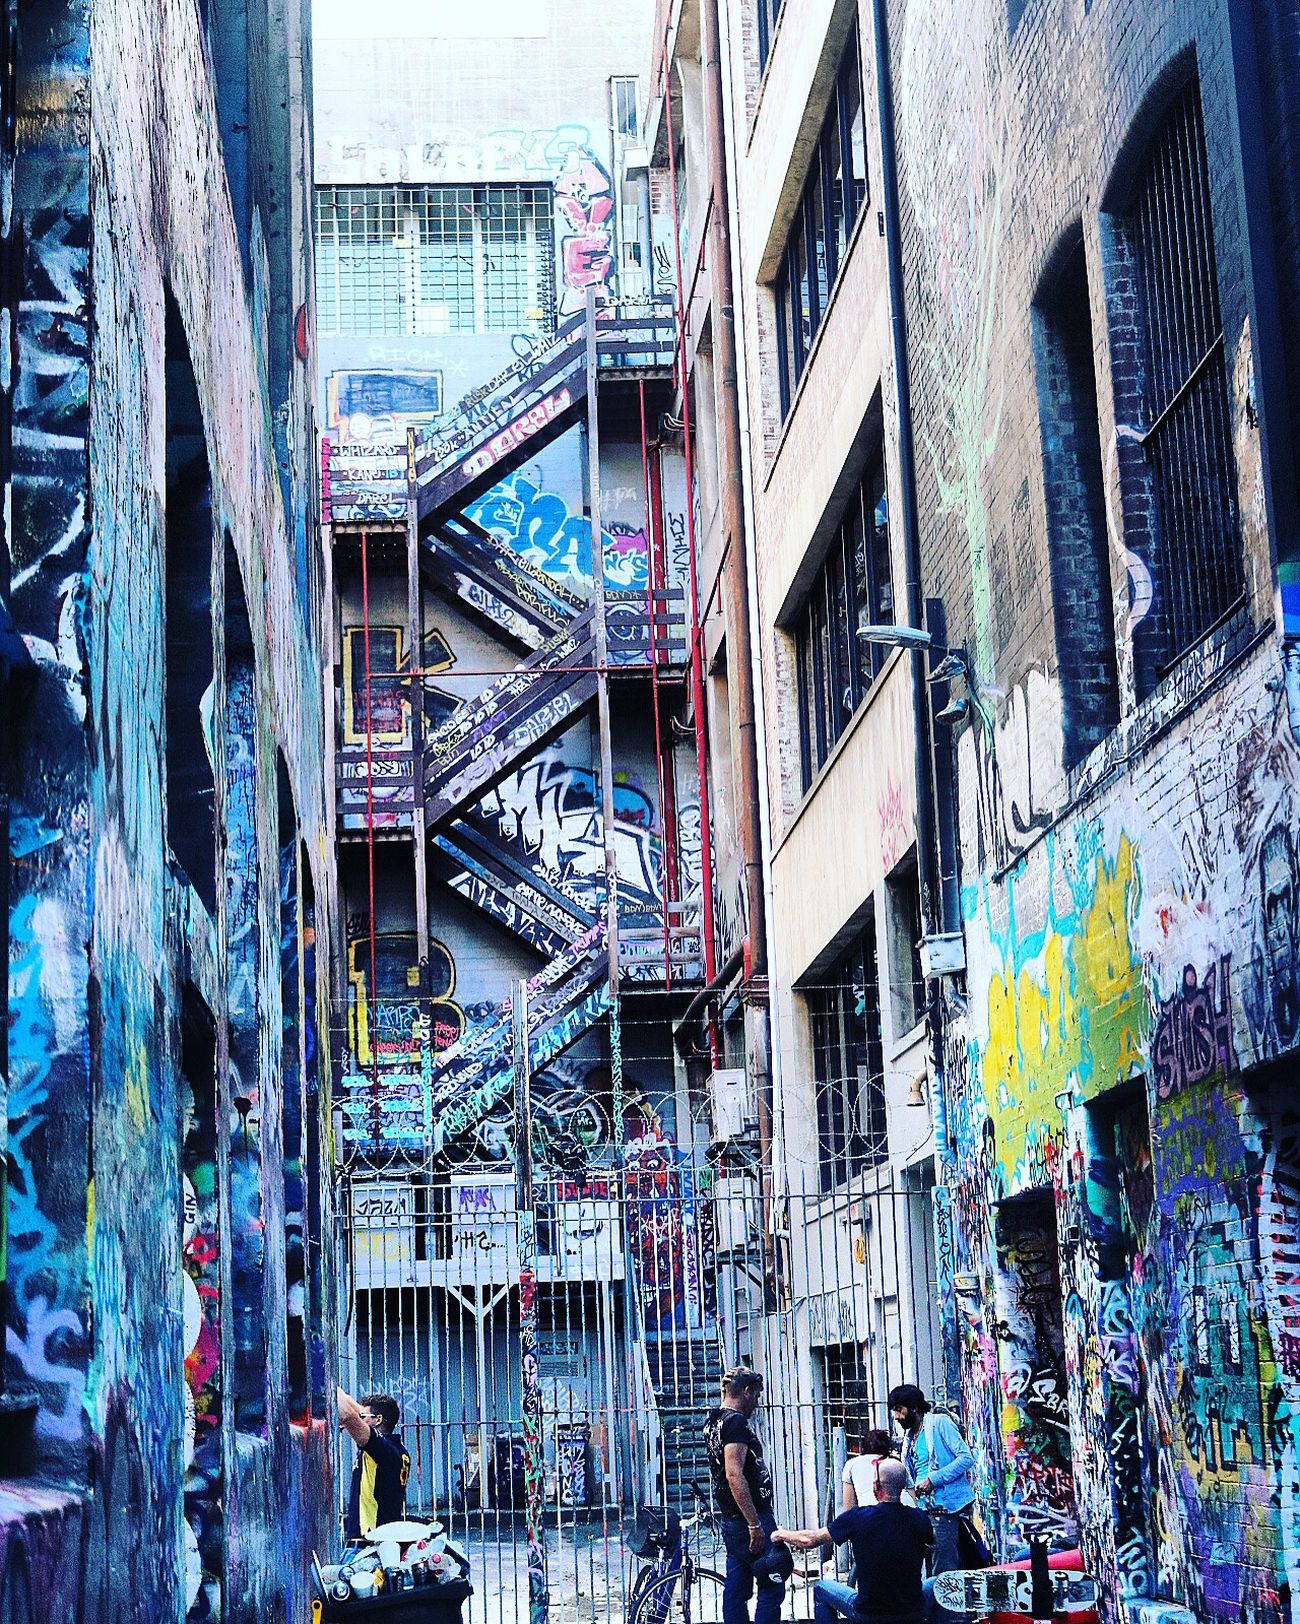 Streetphotography MelbournePhotographer Melbourne City Flinders St #Melbourne MelbourneGraffiti Jorzz Busystranger